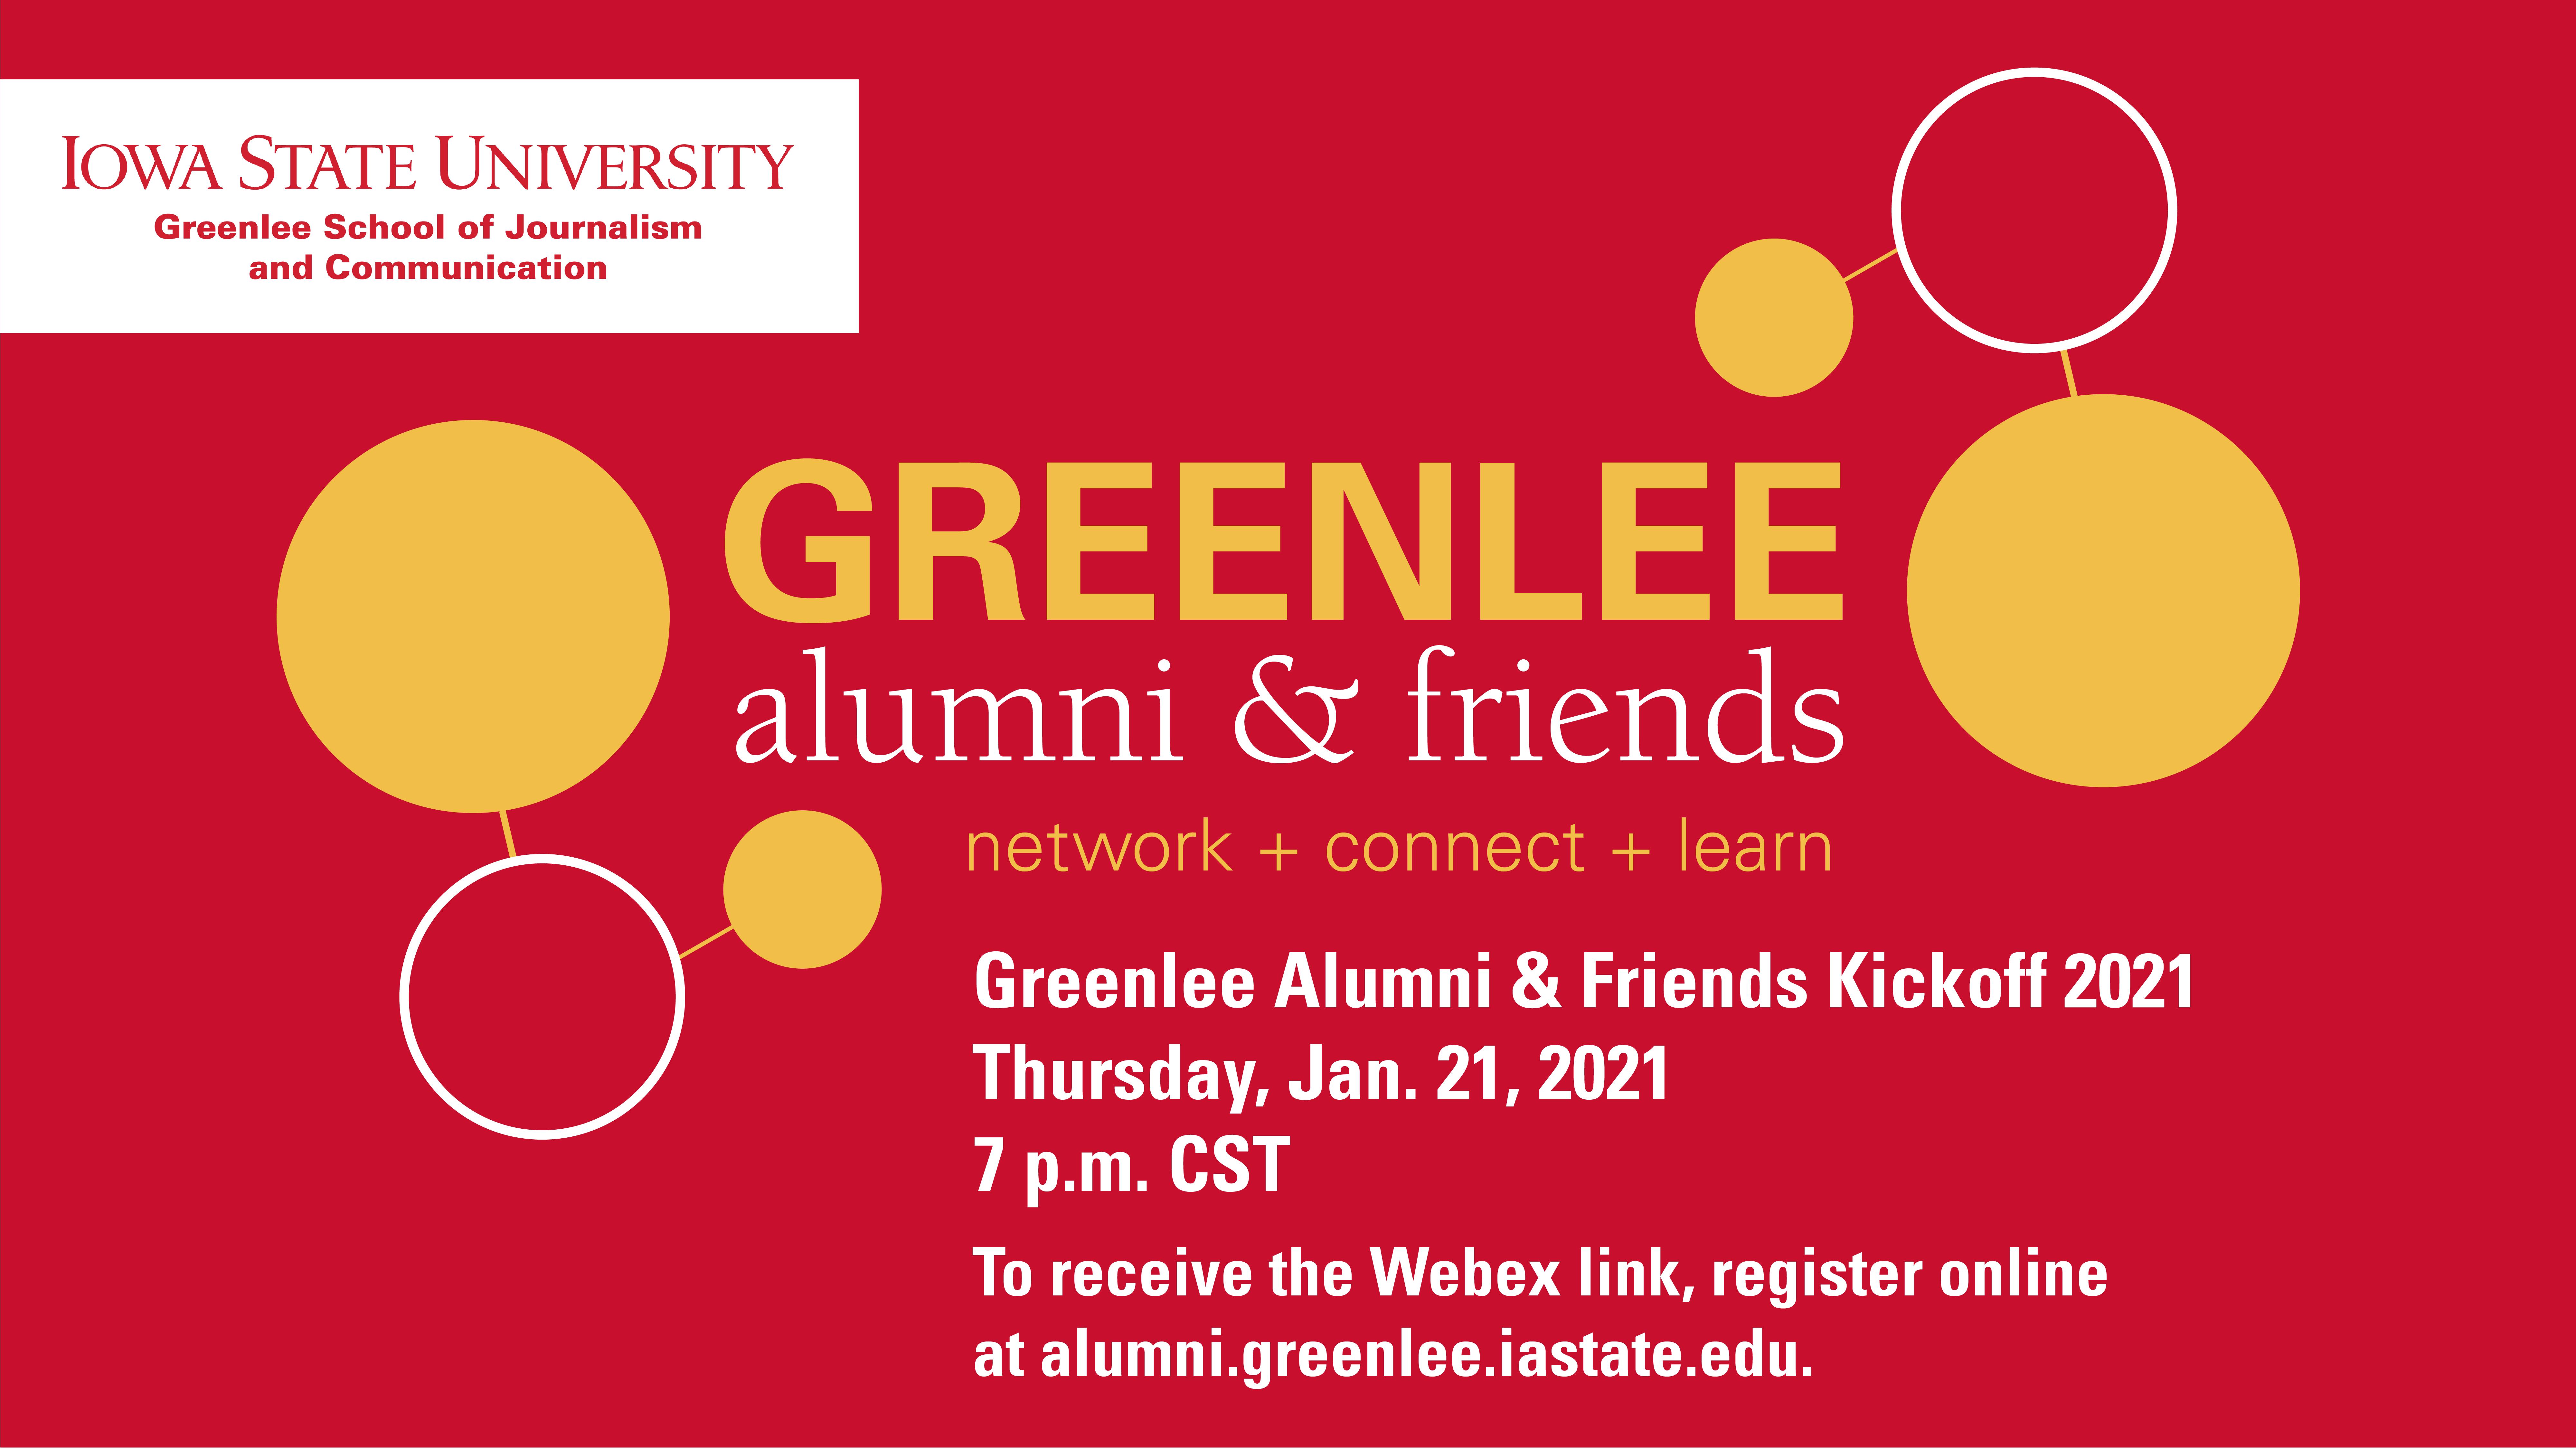 Greenlee Alumni and Friends Kickoff Graphic 2021